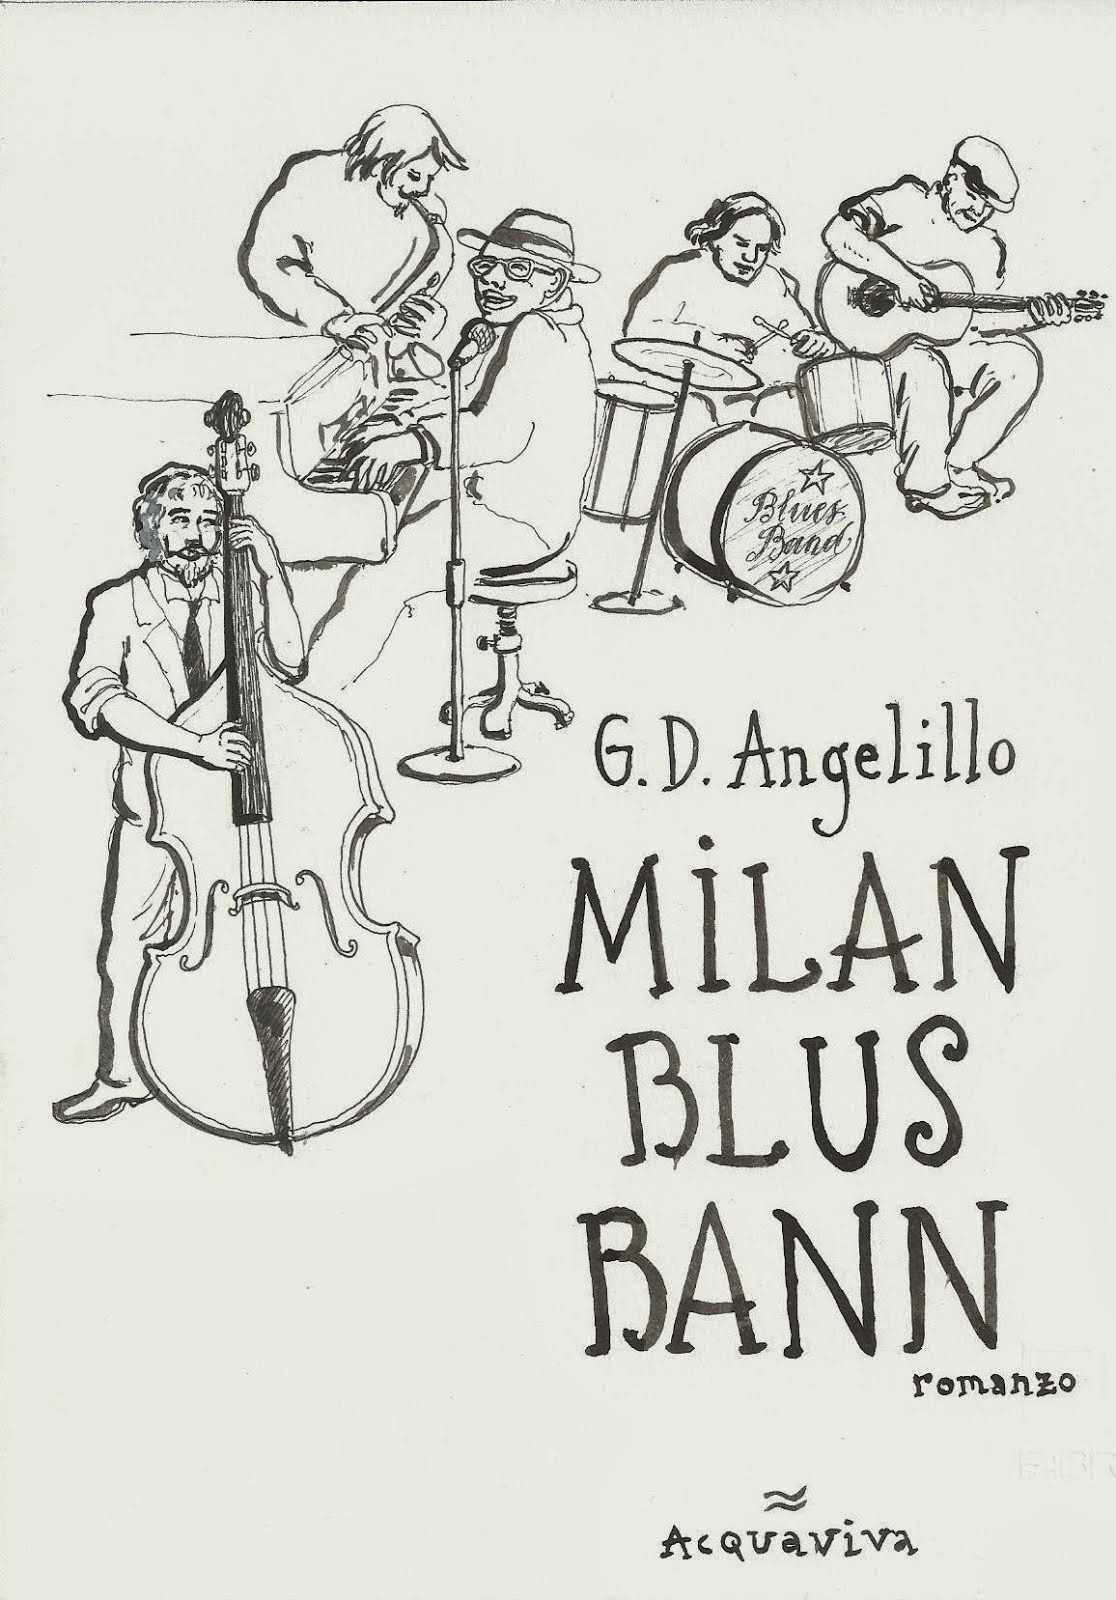 Giuseppe D'Ambrosio Angelillo MILAN BLUS BANN romanzo ACQUAVIVA